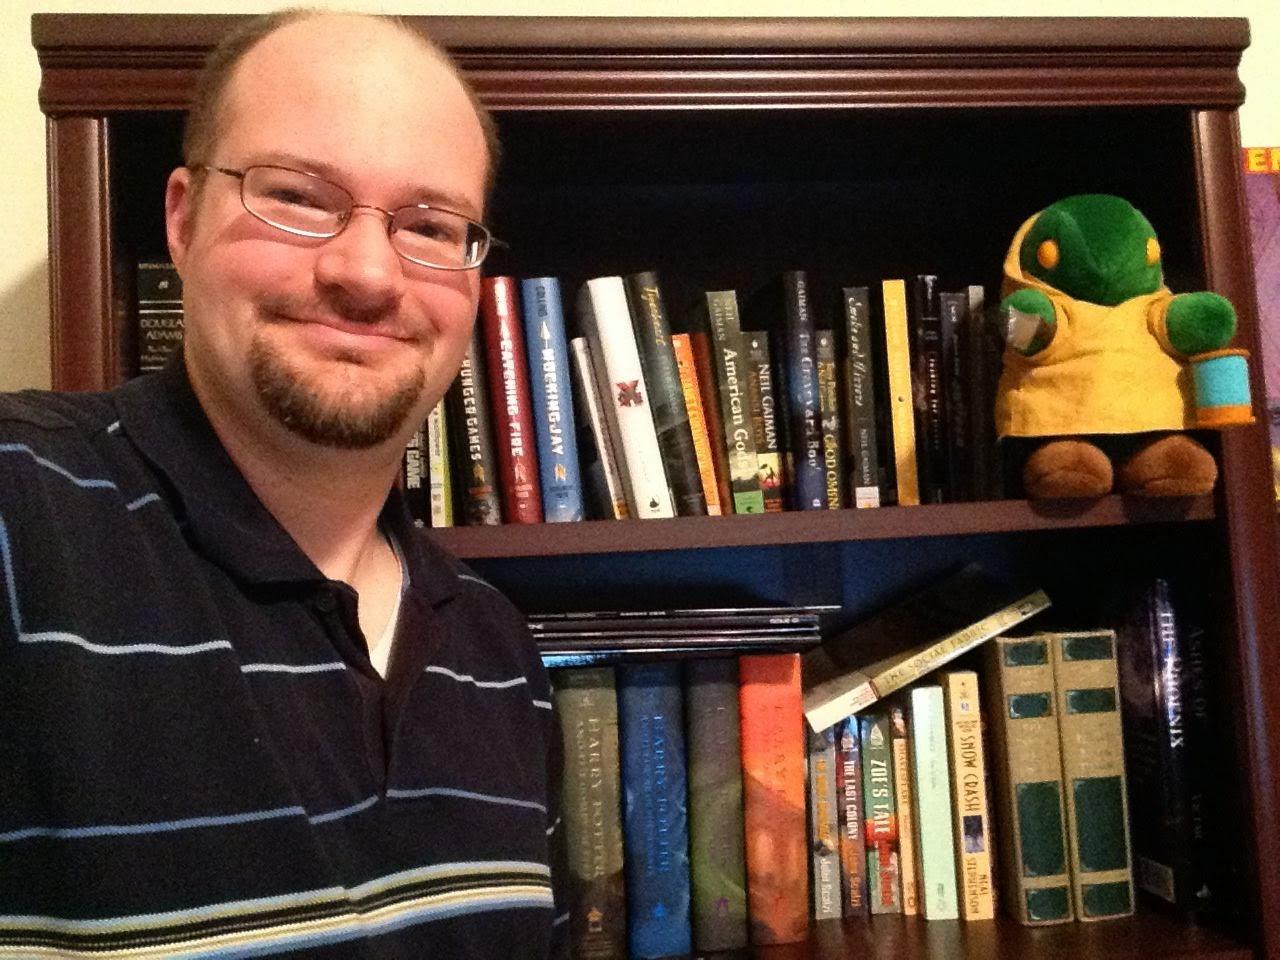 me bookshelf tonberry